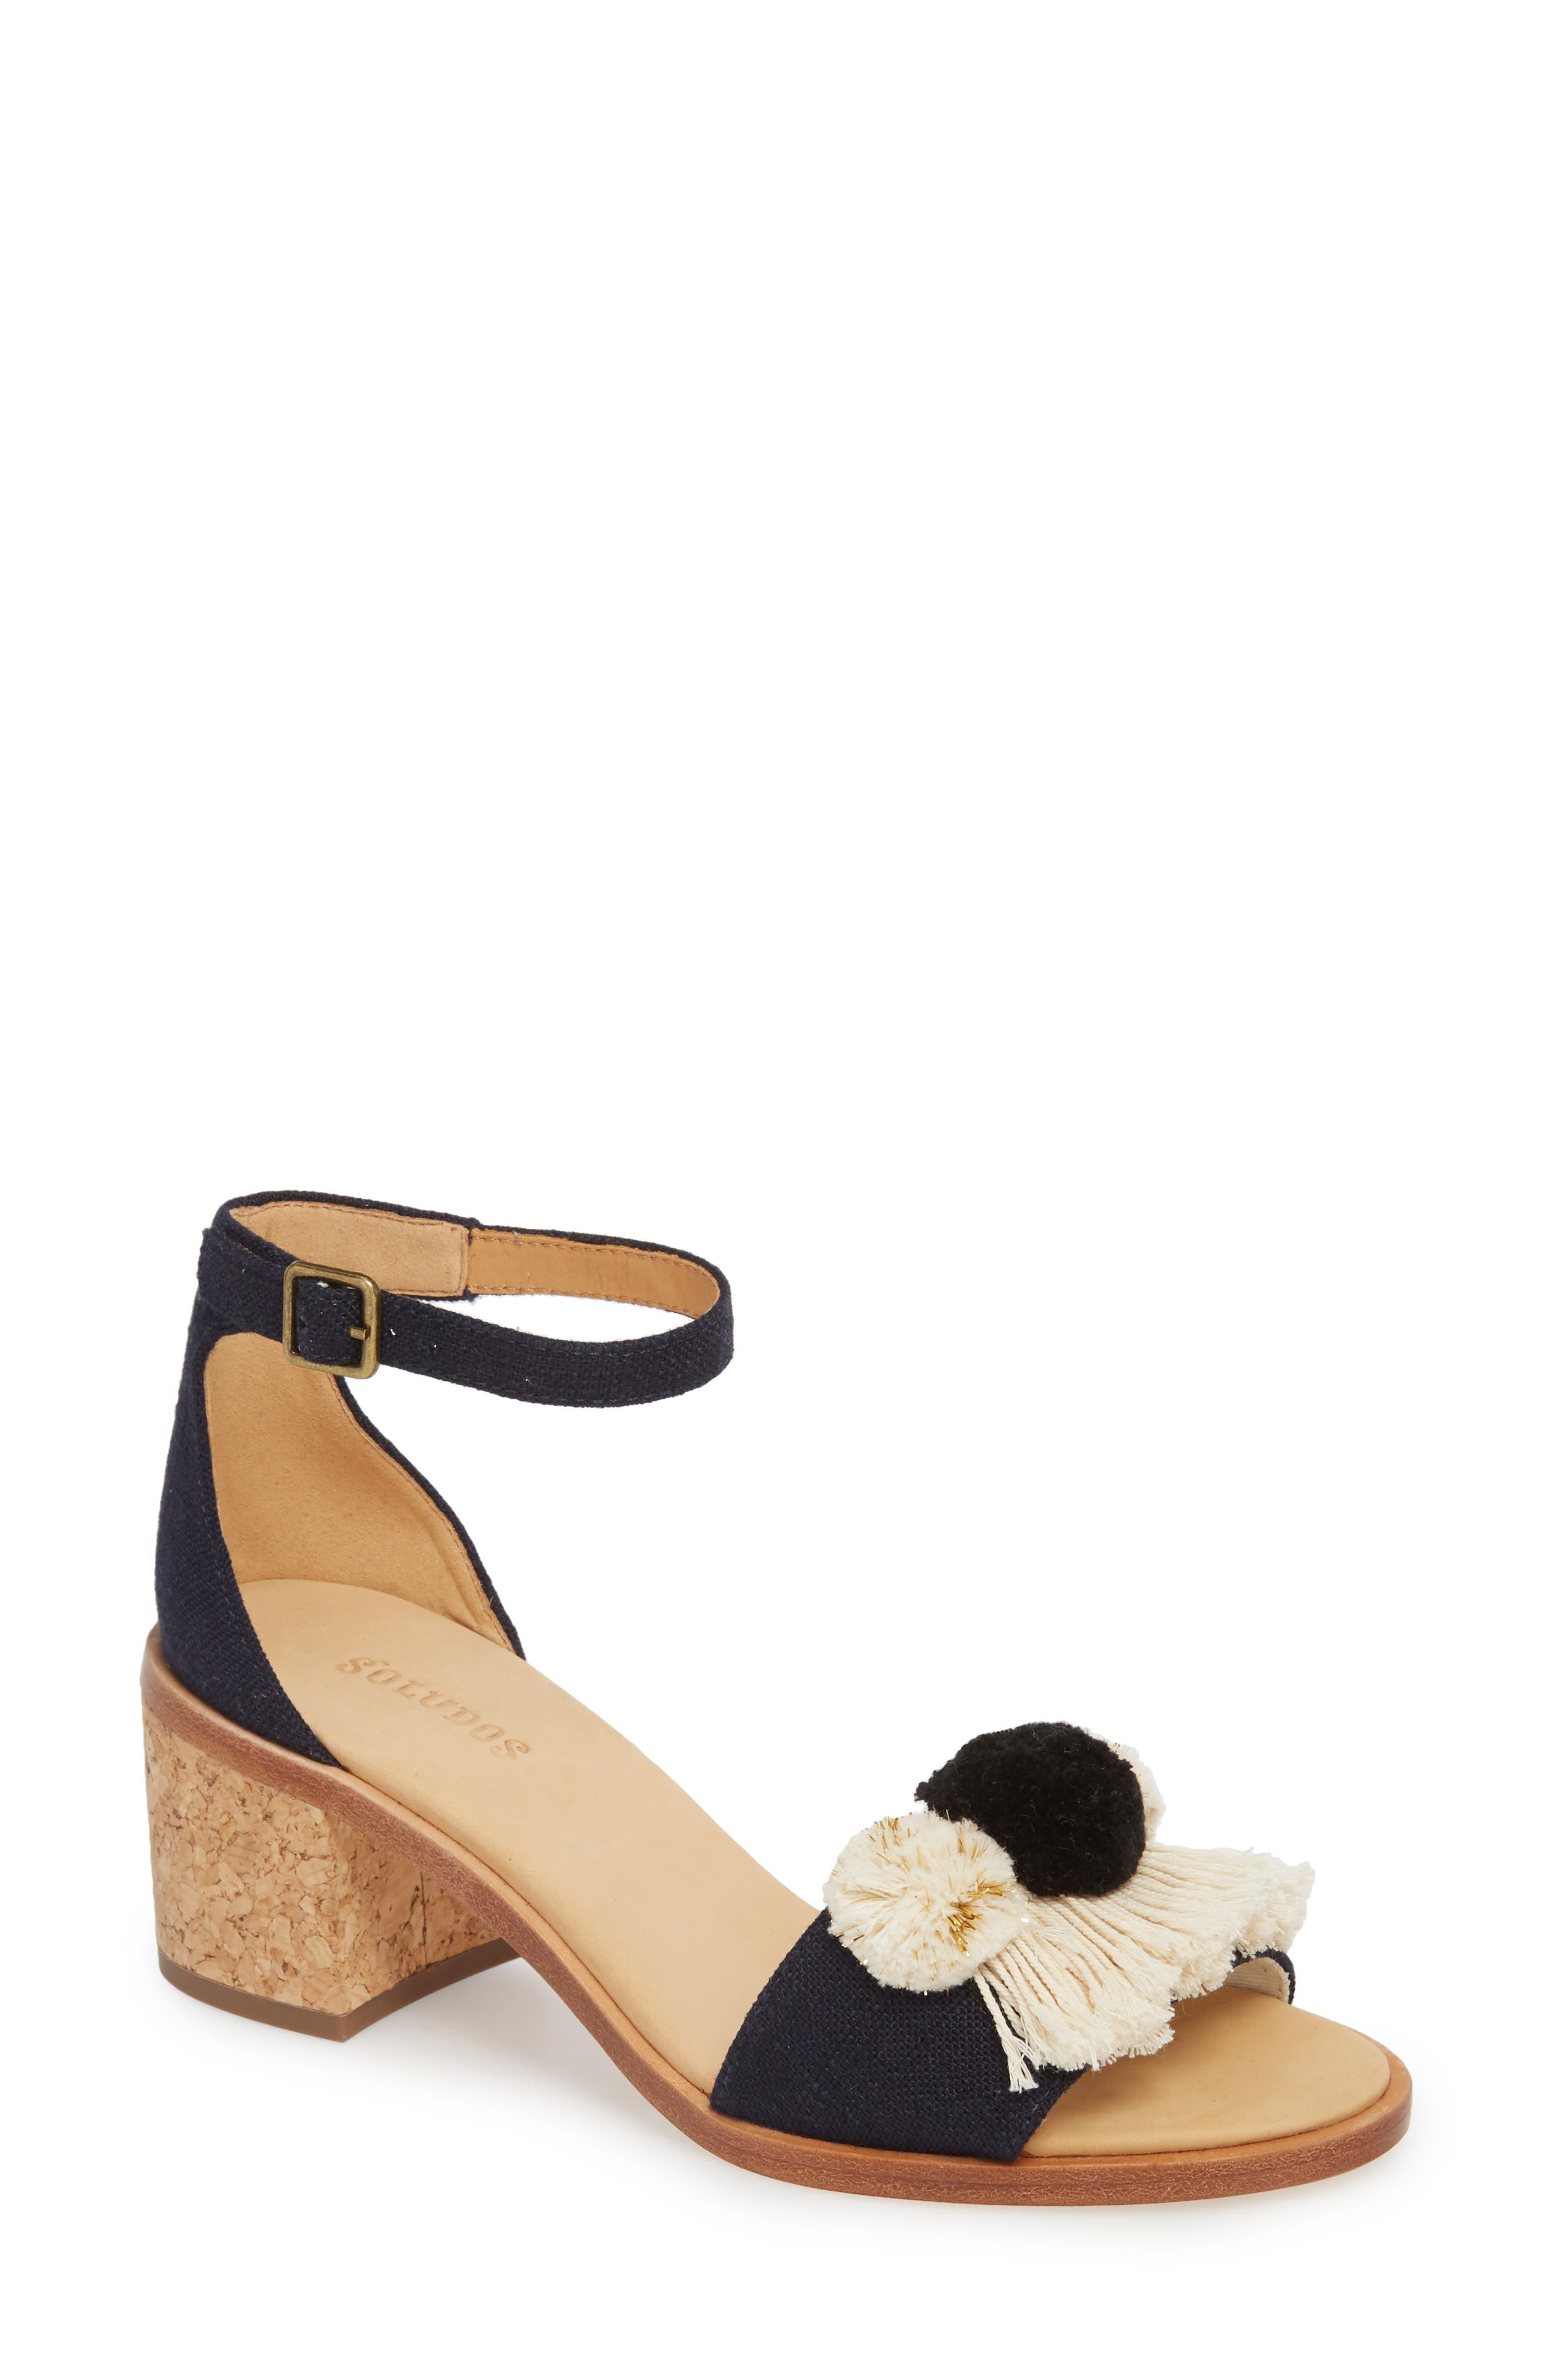 Capri Pom Pom Heel Sandal,                         Main,                         color, Eclipse